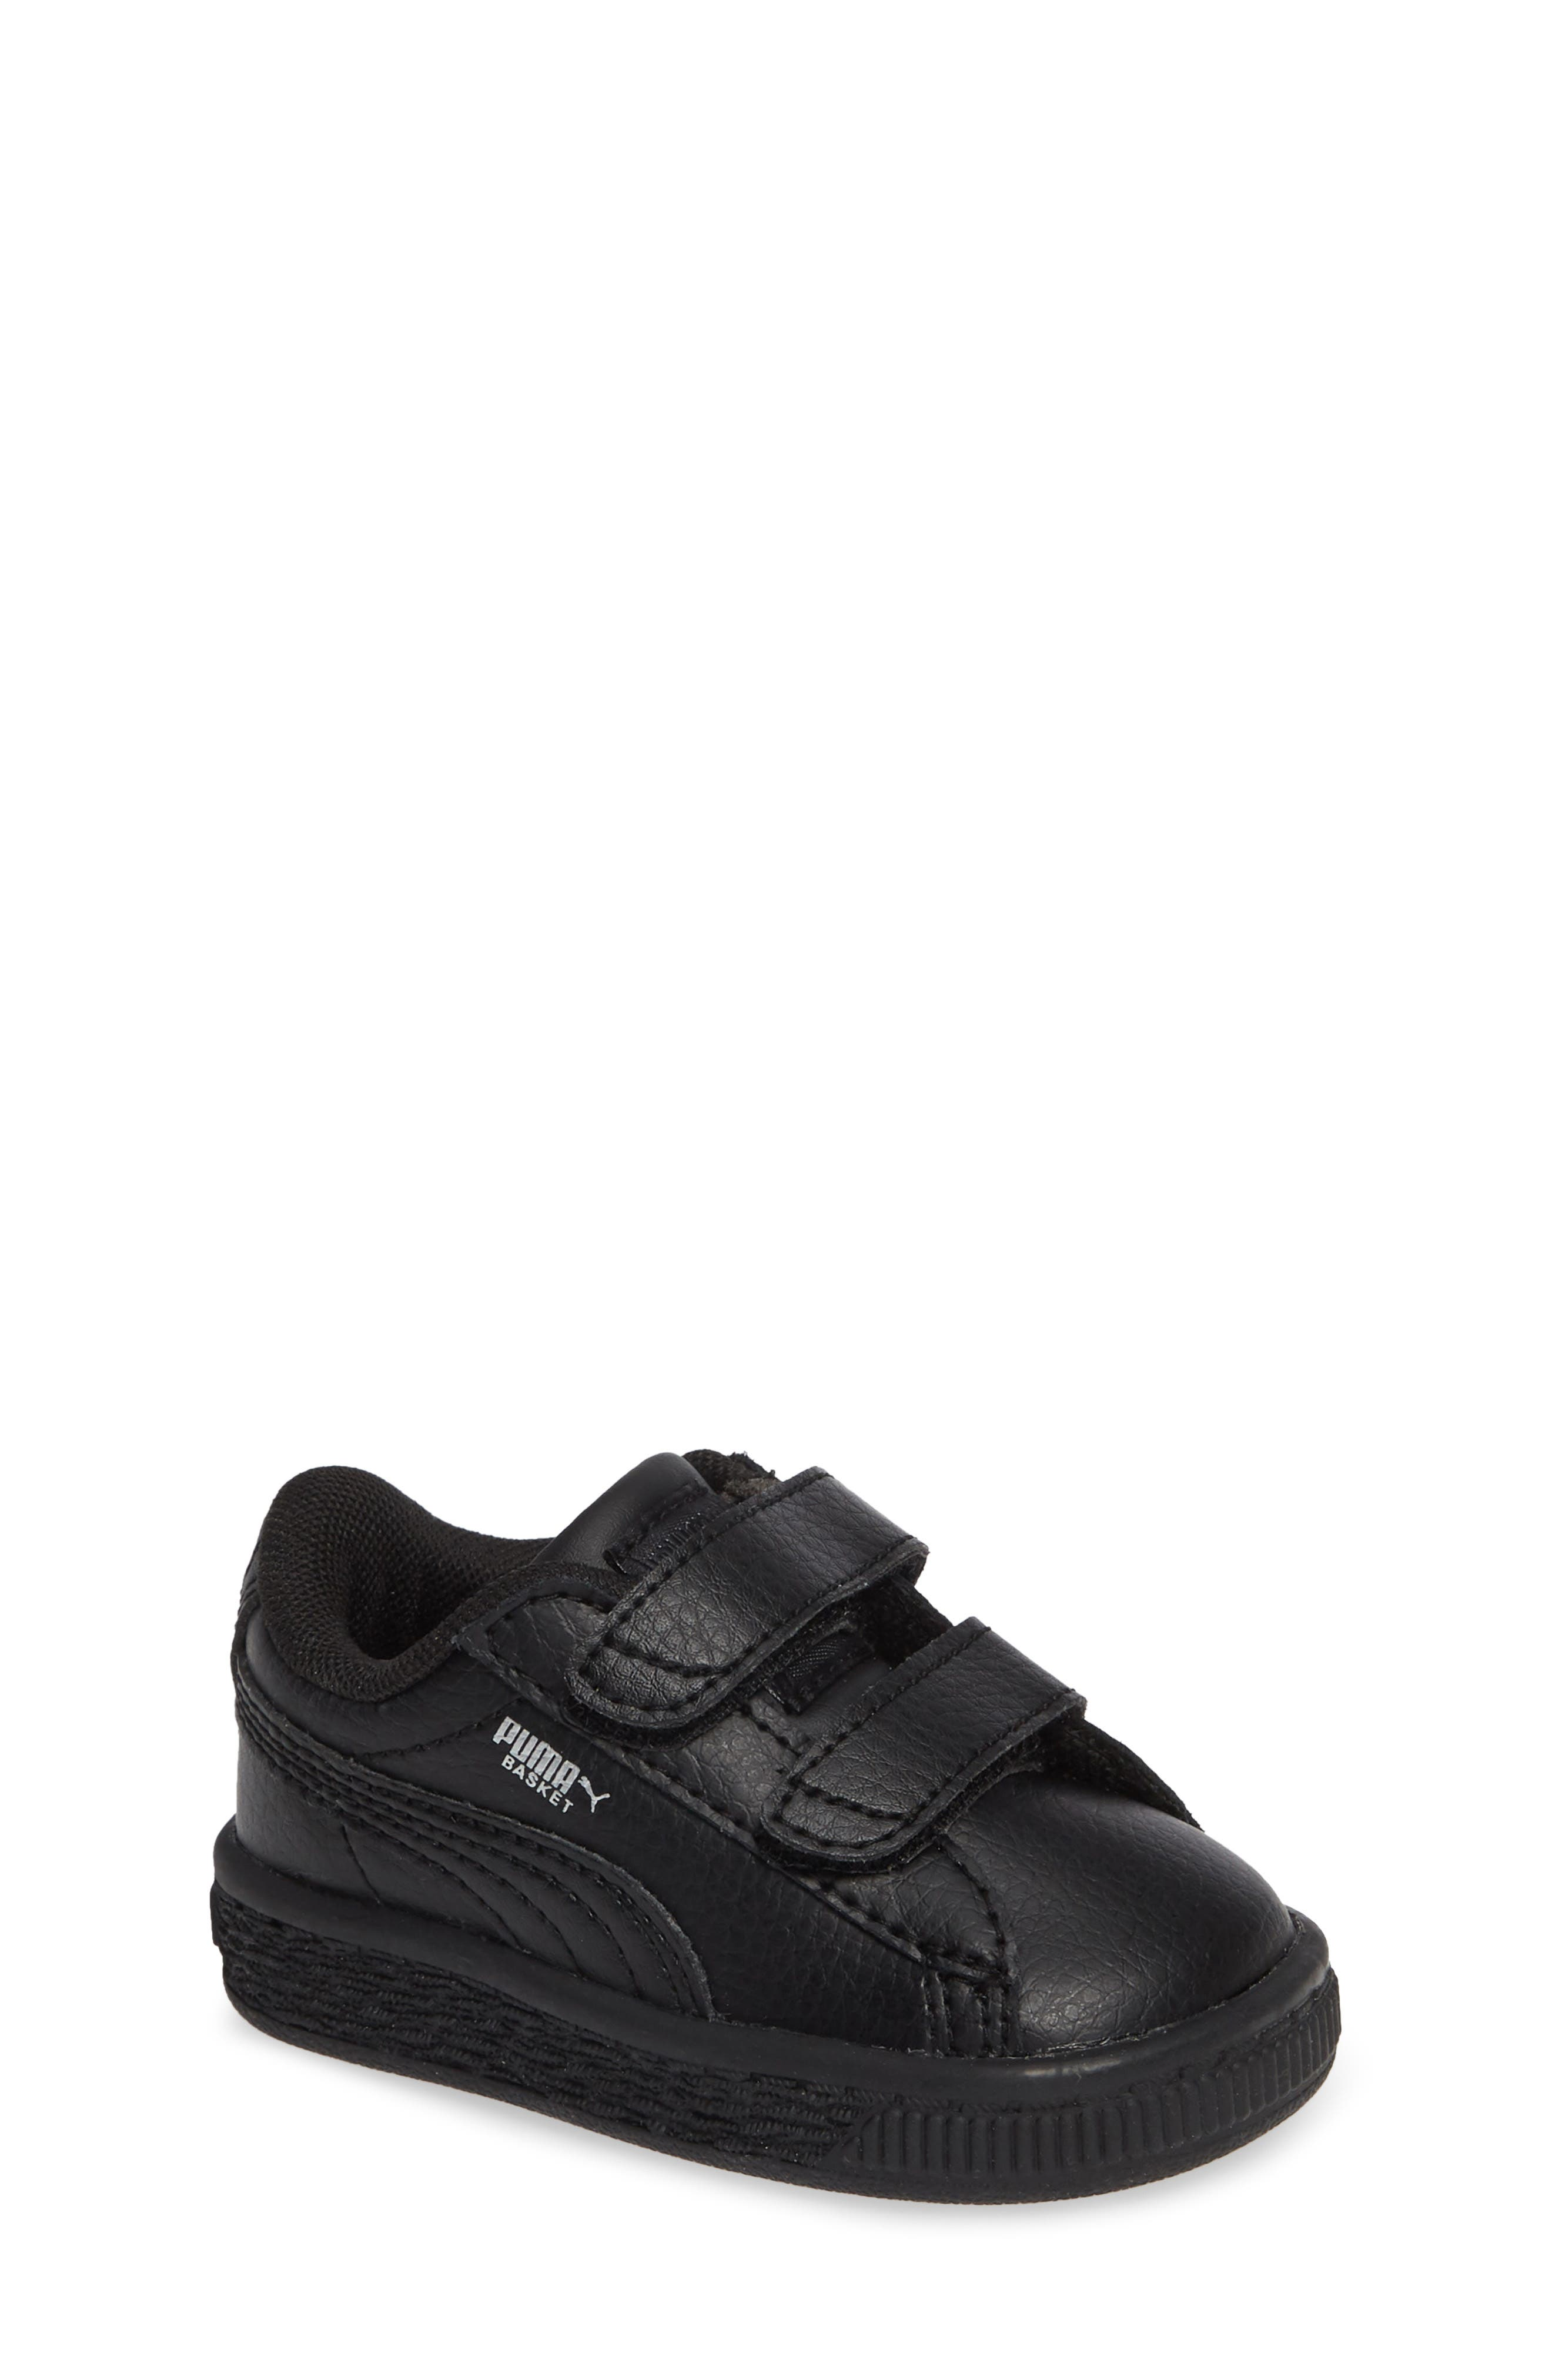 Basket Classic Sneaker,                         Main,                         color, 001